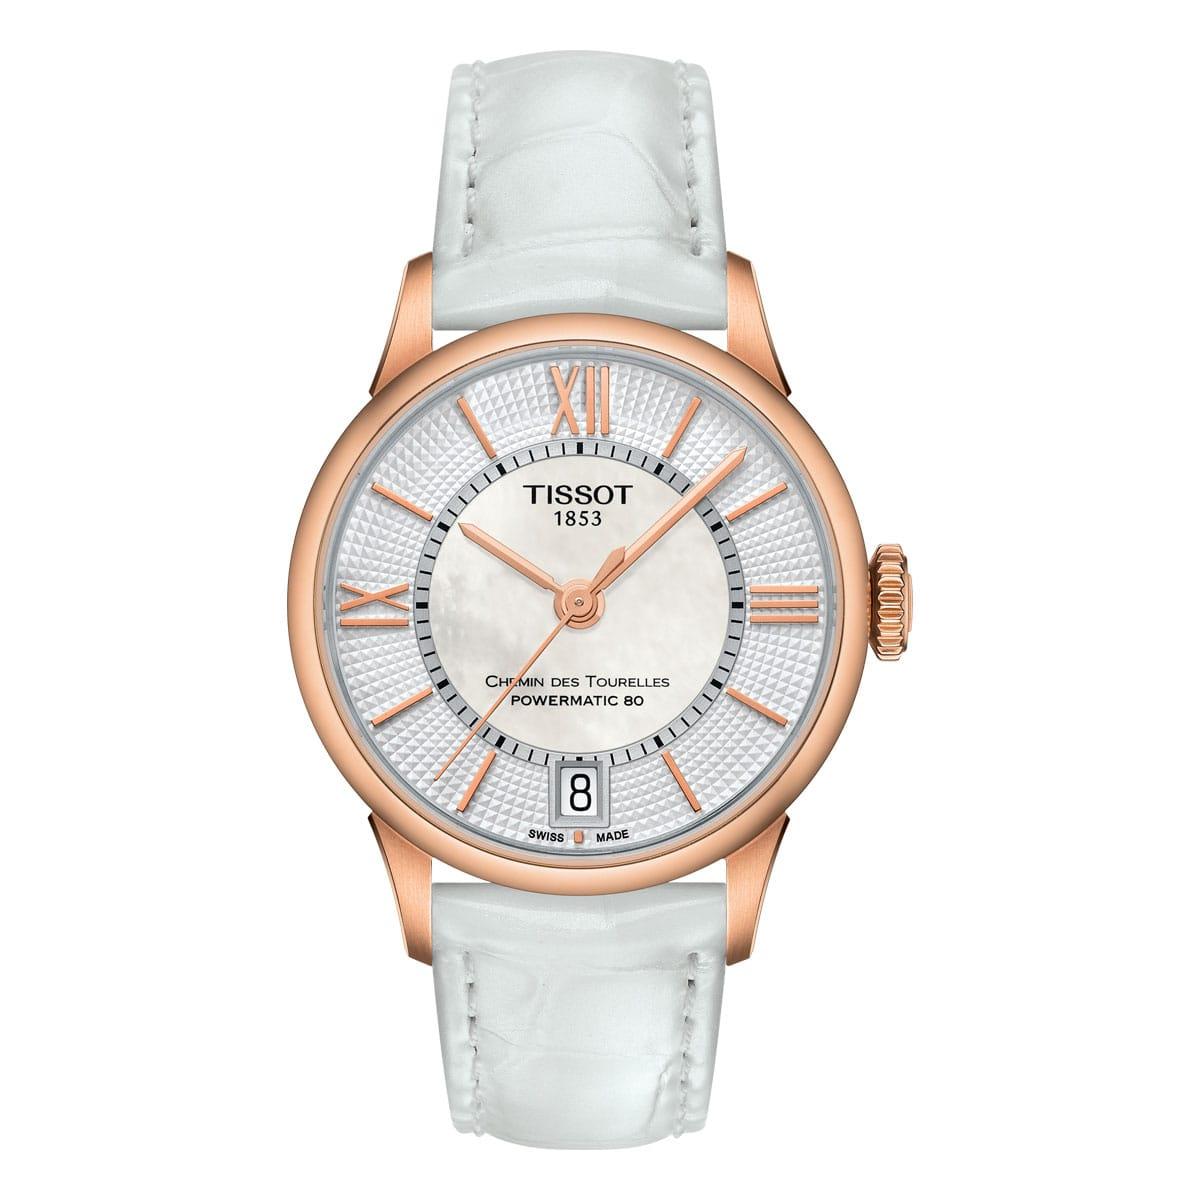 Tissot-Chemin-de-Tourelles-Powermatic-T099-207-36-118-00 Lionel Meylan Horlogerie Joaillerie Vevey